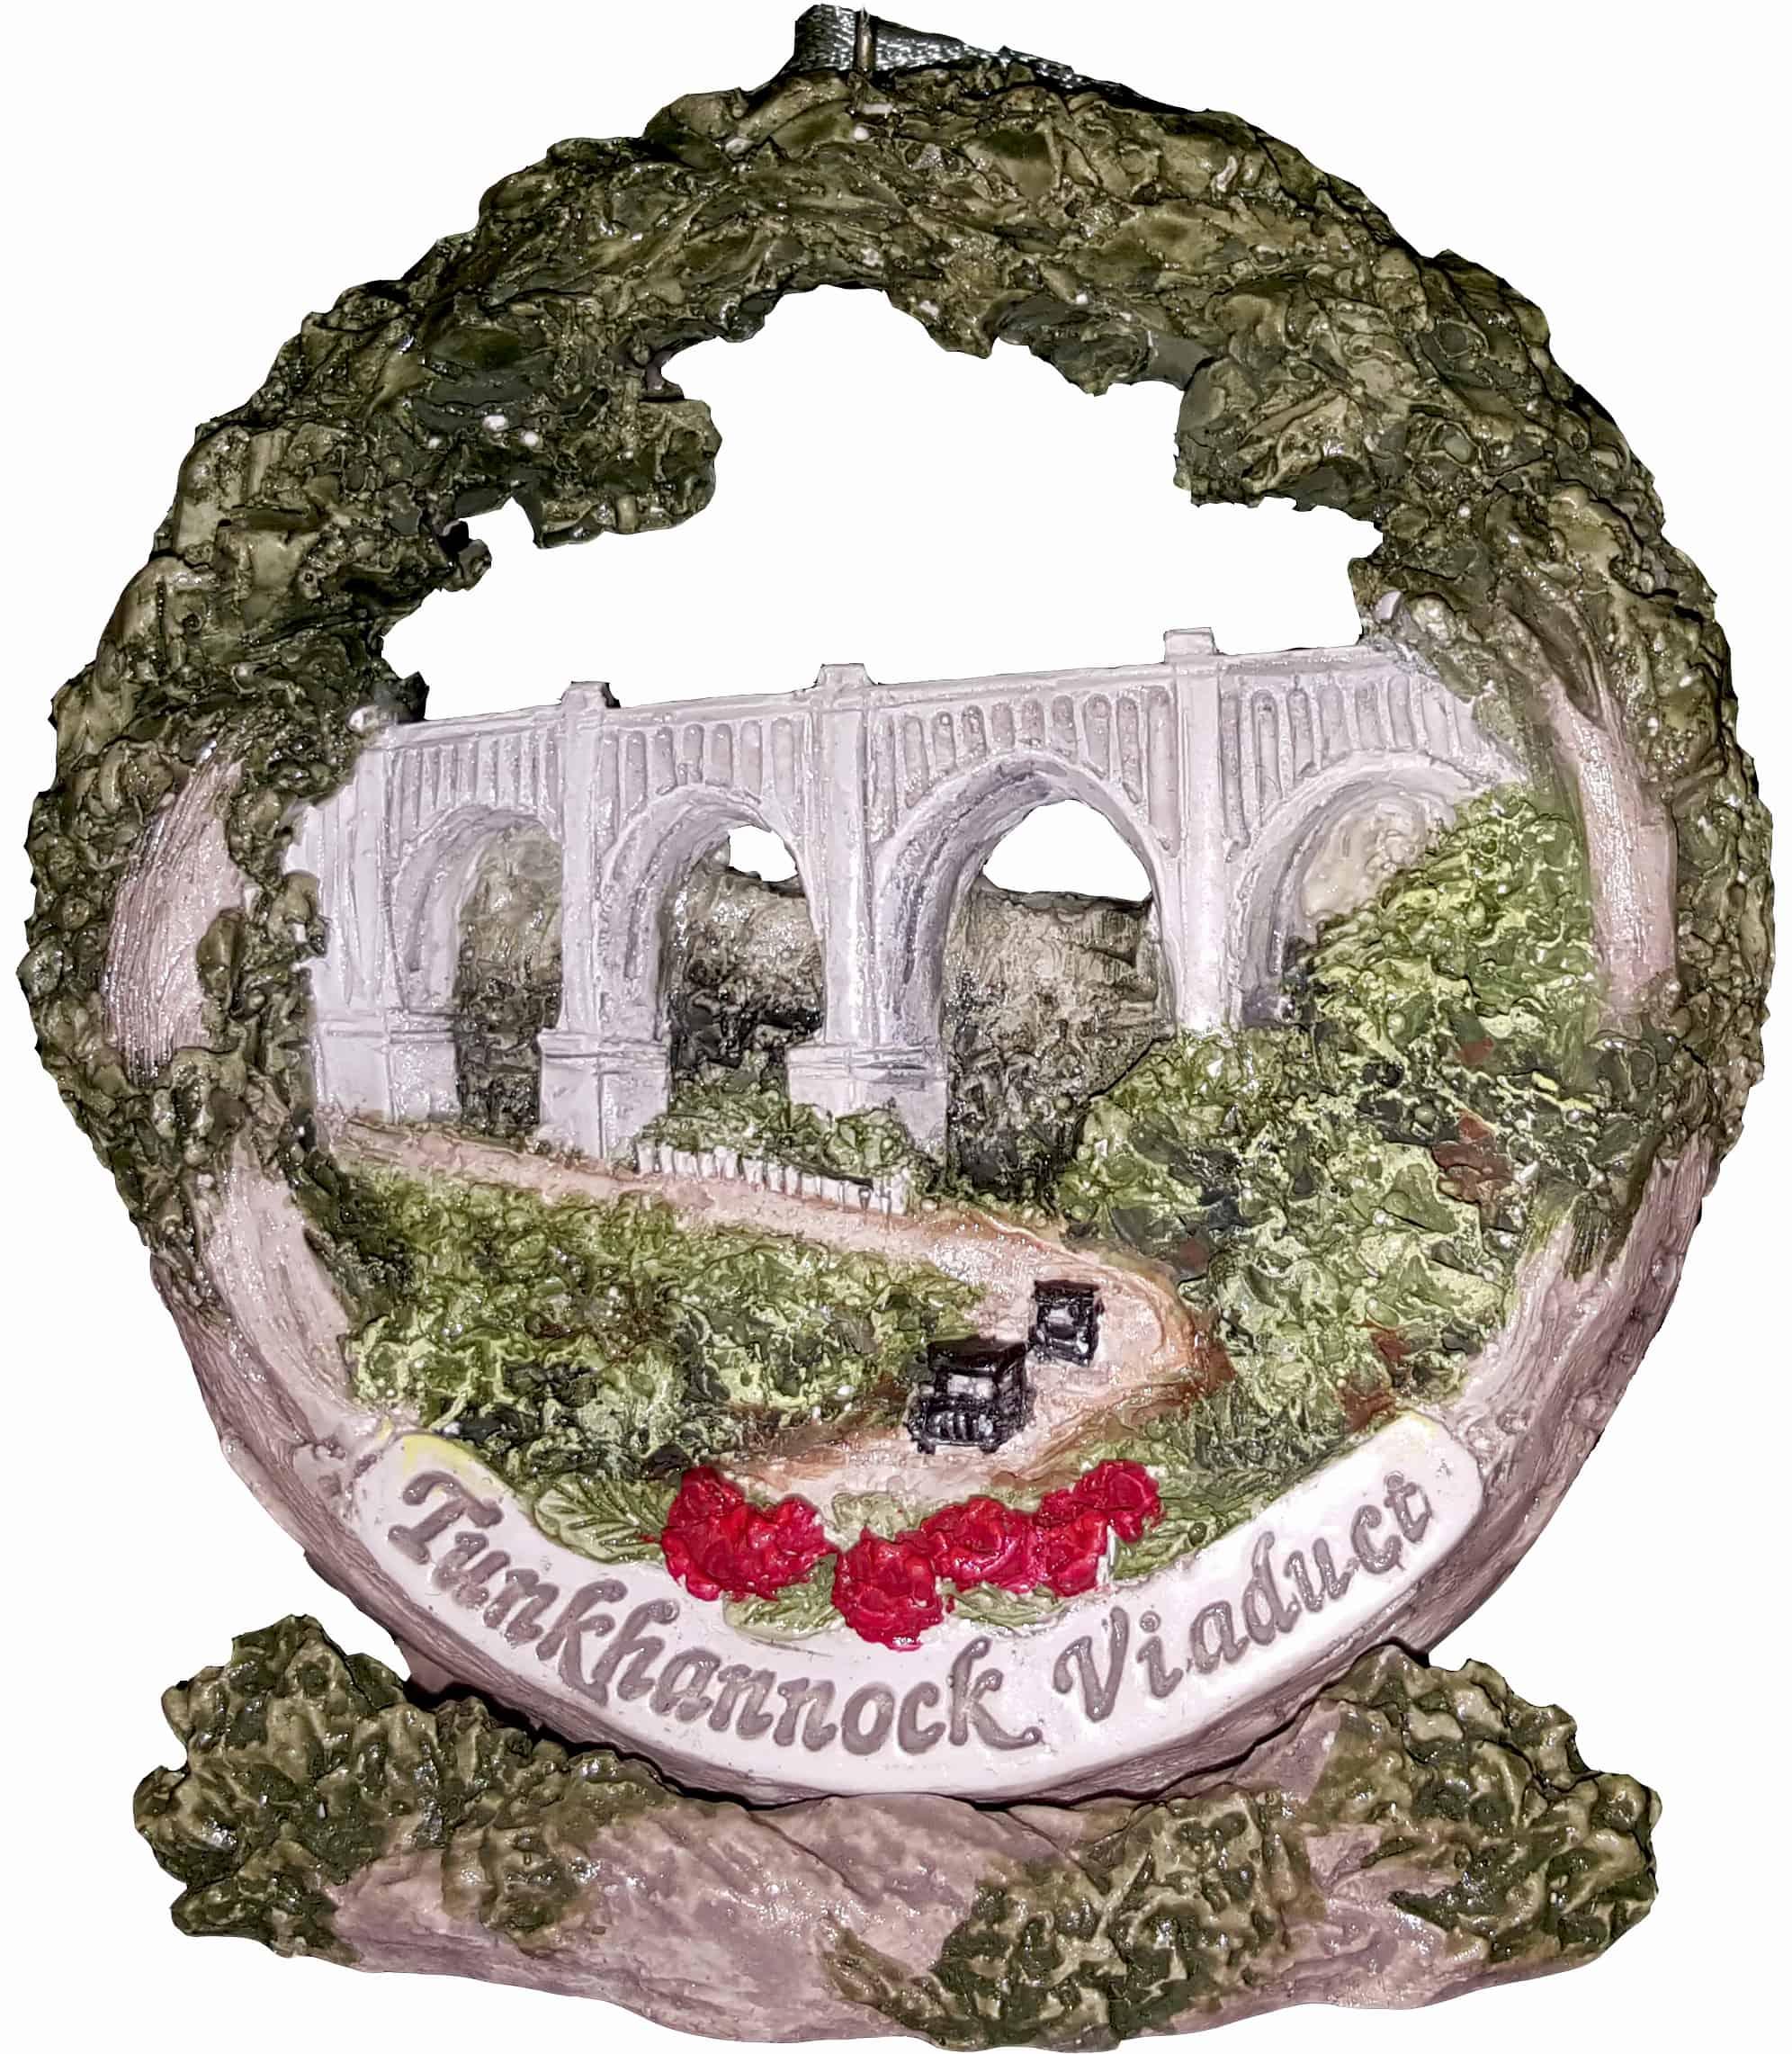 Tunkhannock Viaduct/Nicholson Bridge